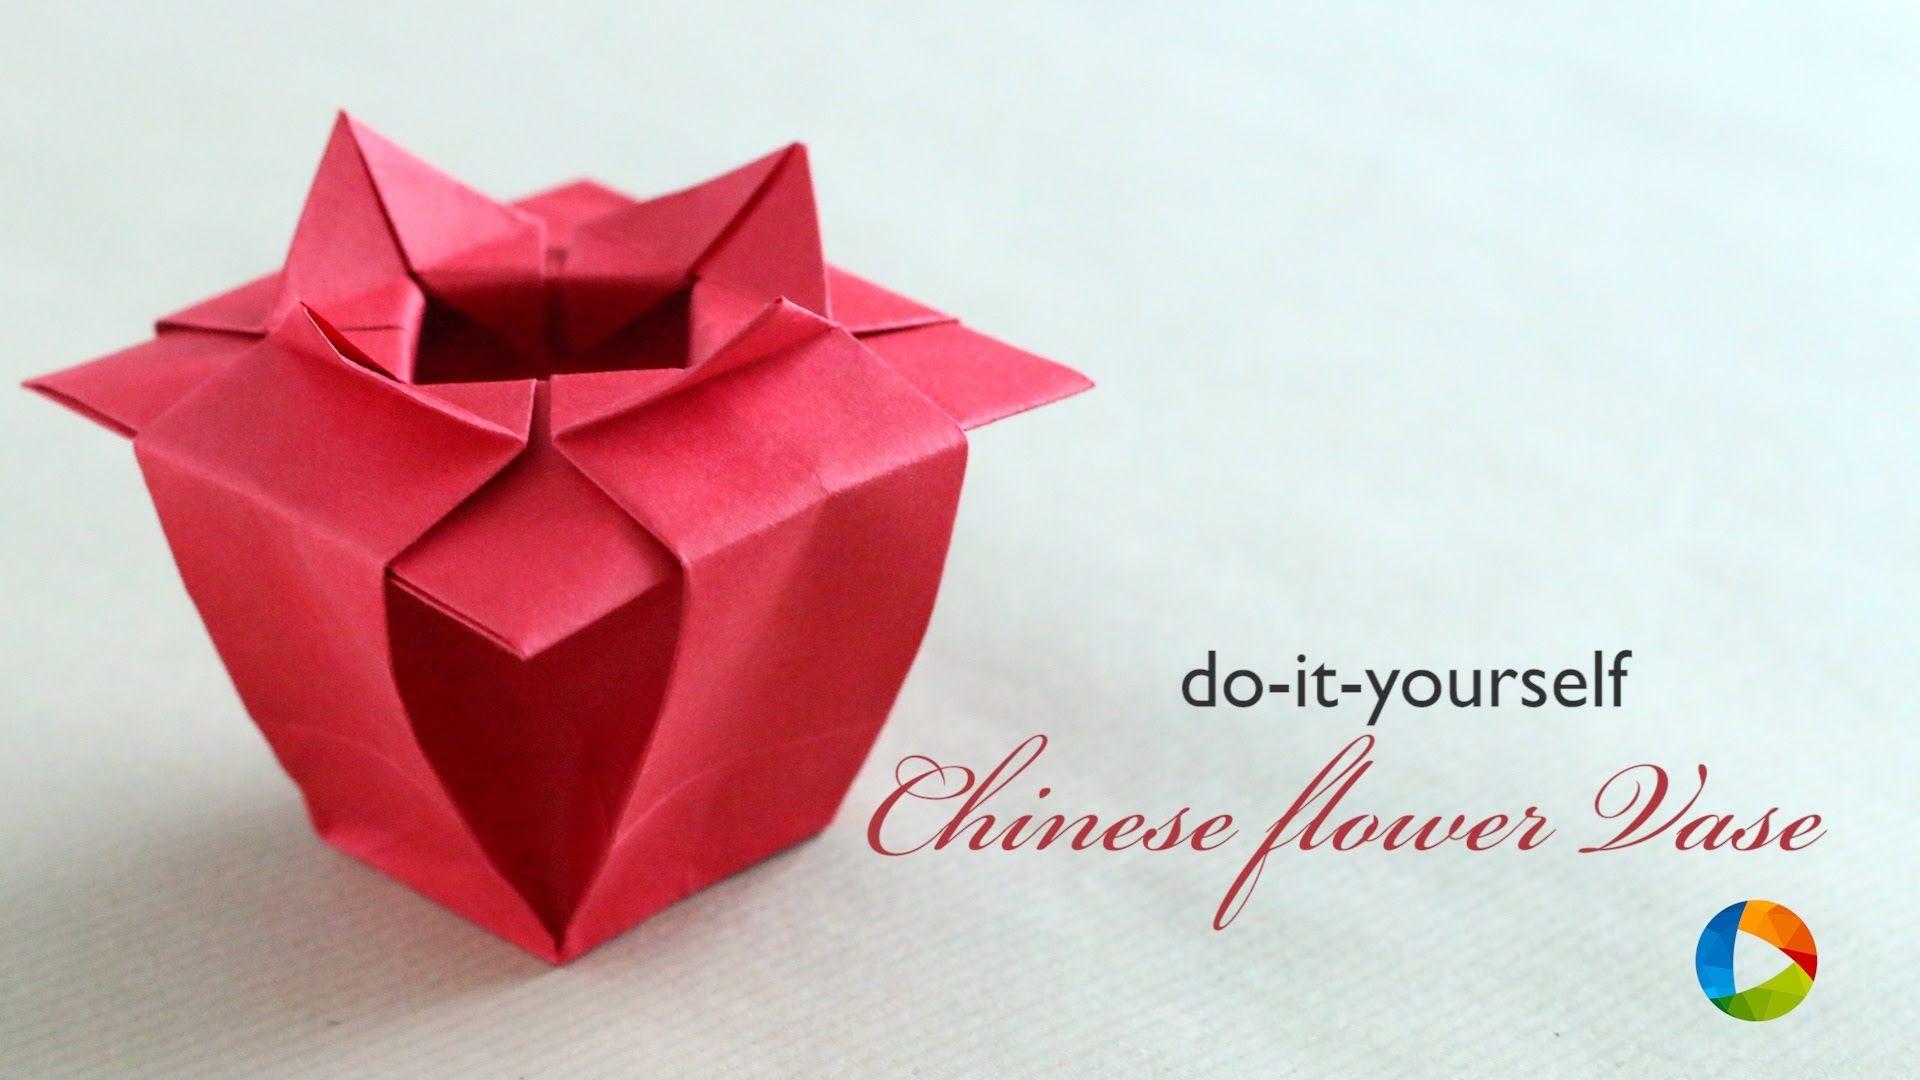 How To Make Origami Chinese Flower Vase Caixas E Envelopes